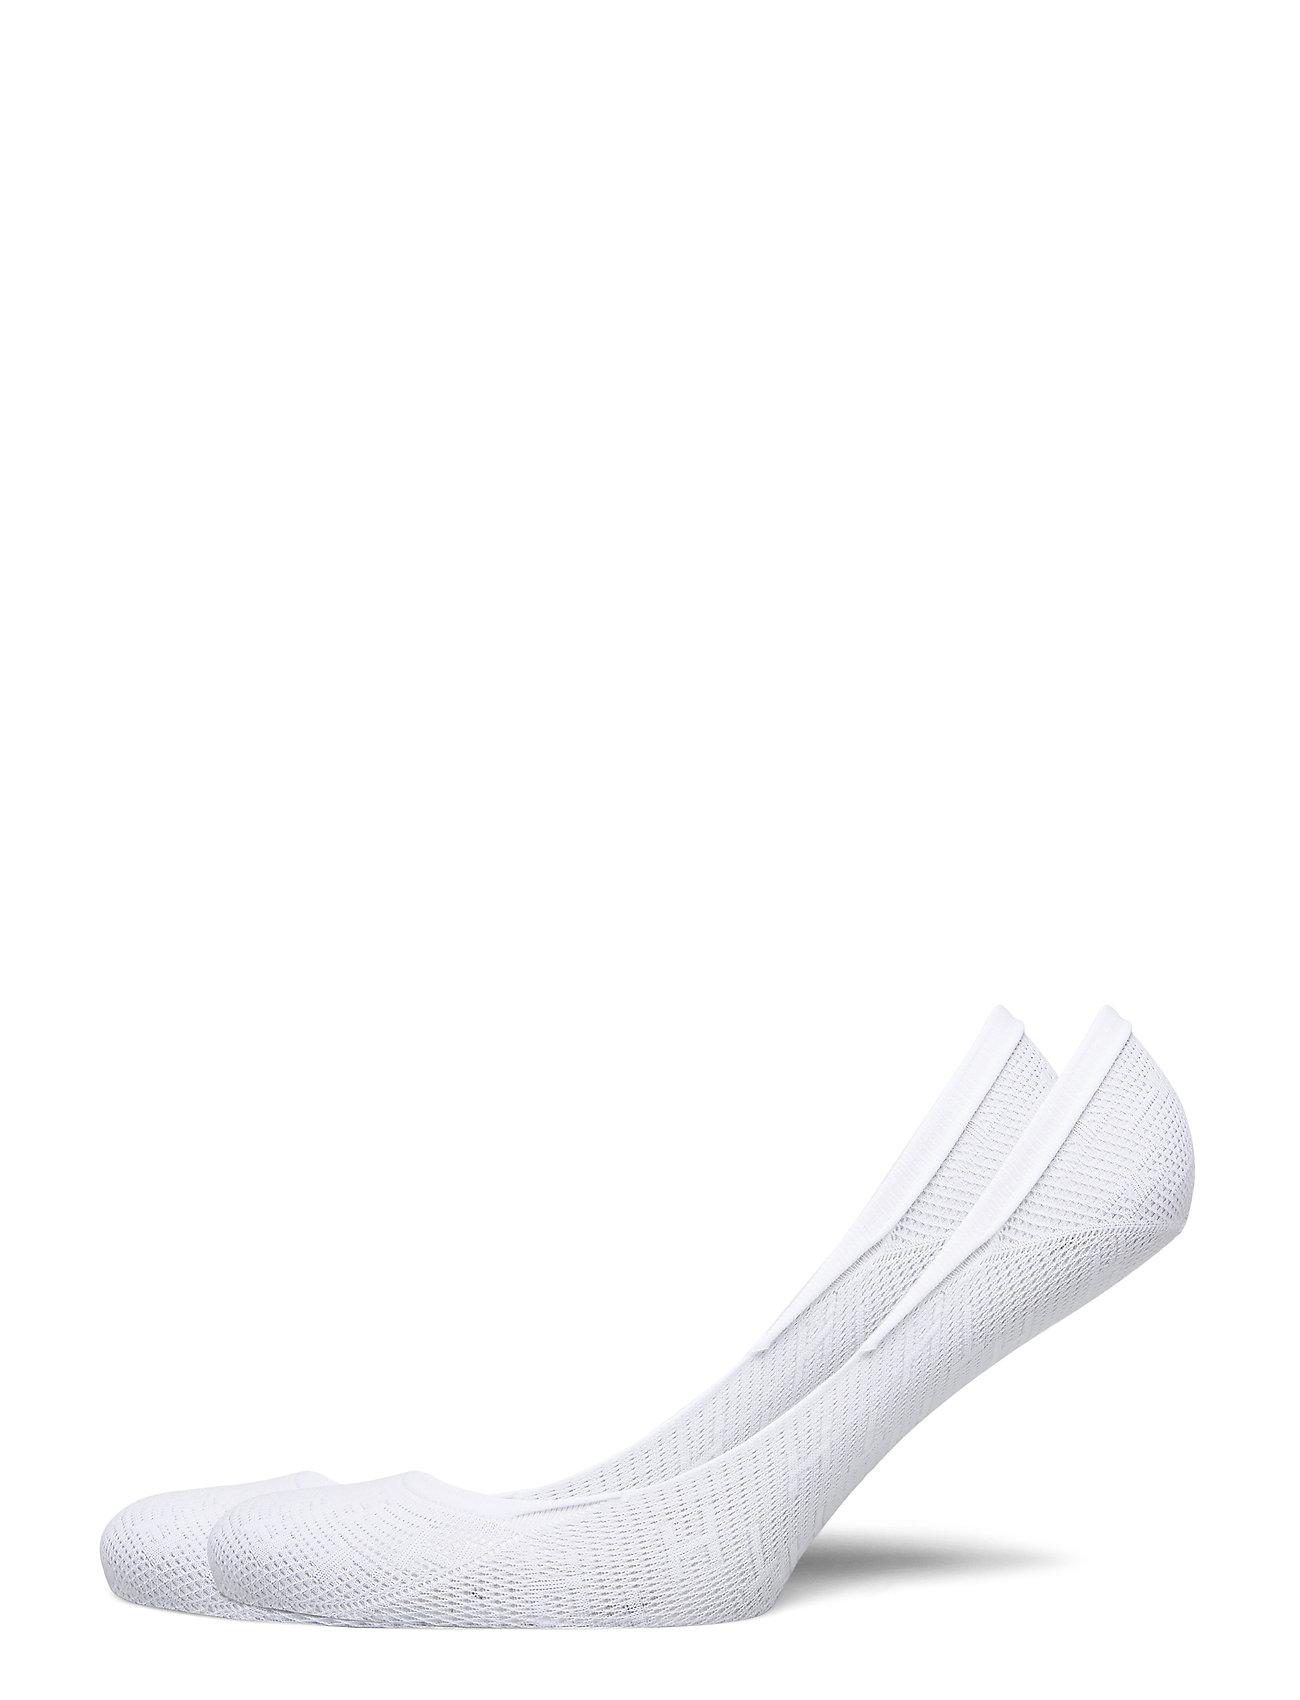 Image of Th Women Footie 2p Th Burn Out Lingerie Socks Footies/Ankle Socks Hvid Tommy Hilfiger (3455958667)